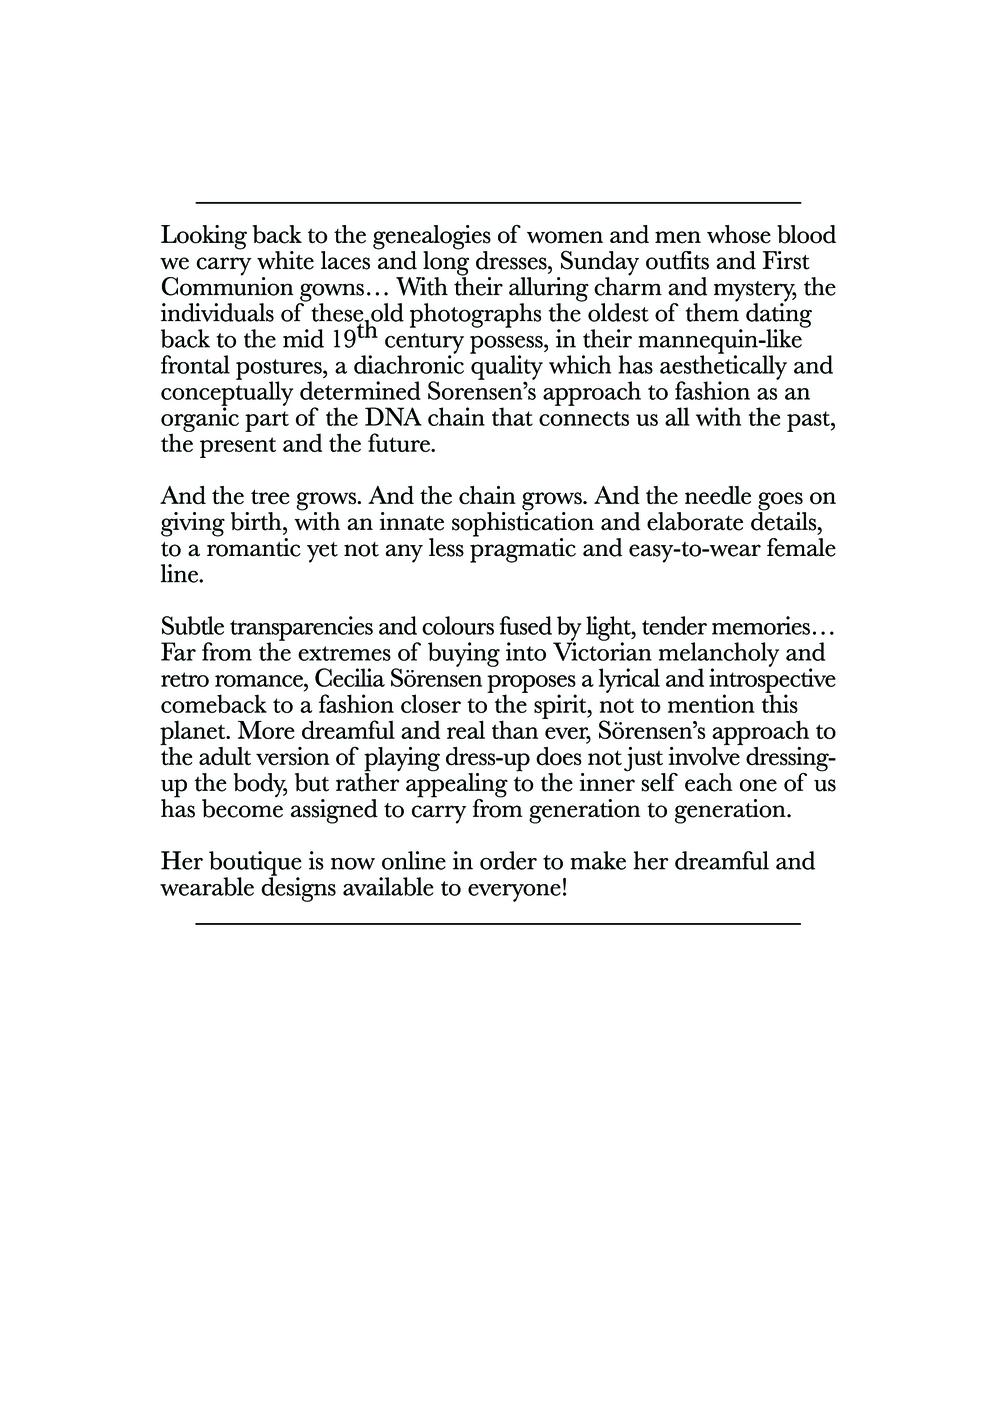 CS page 6.jpg